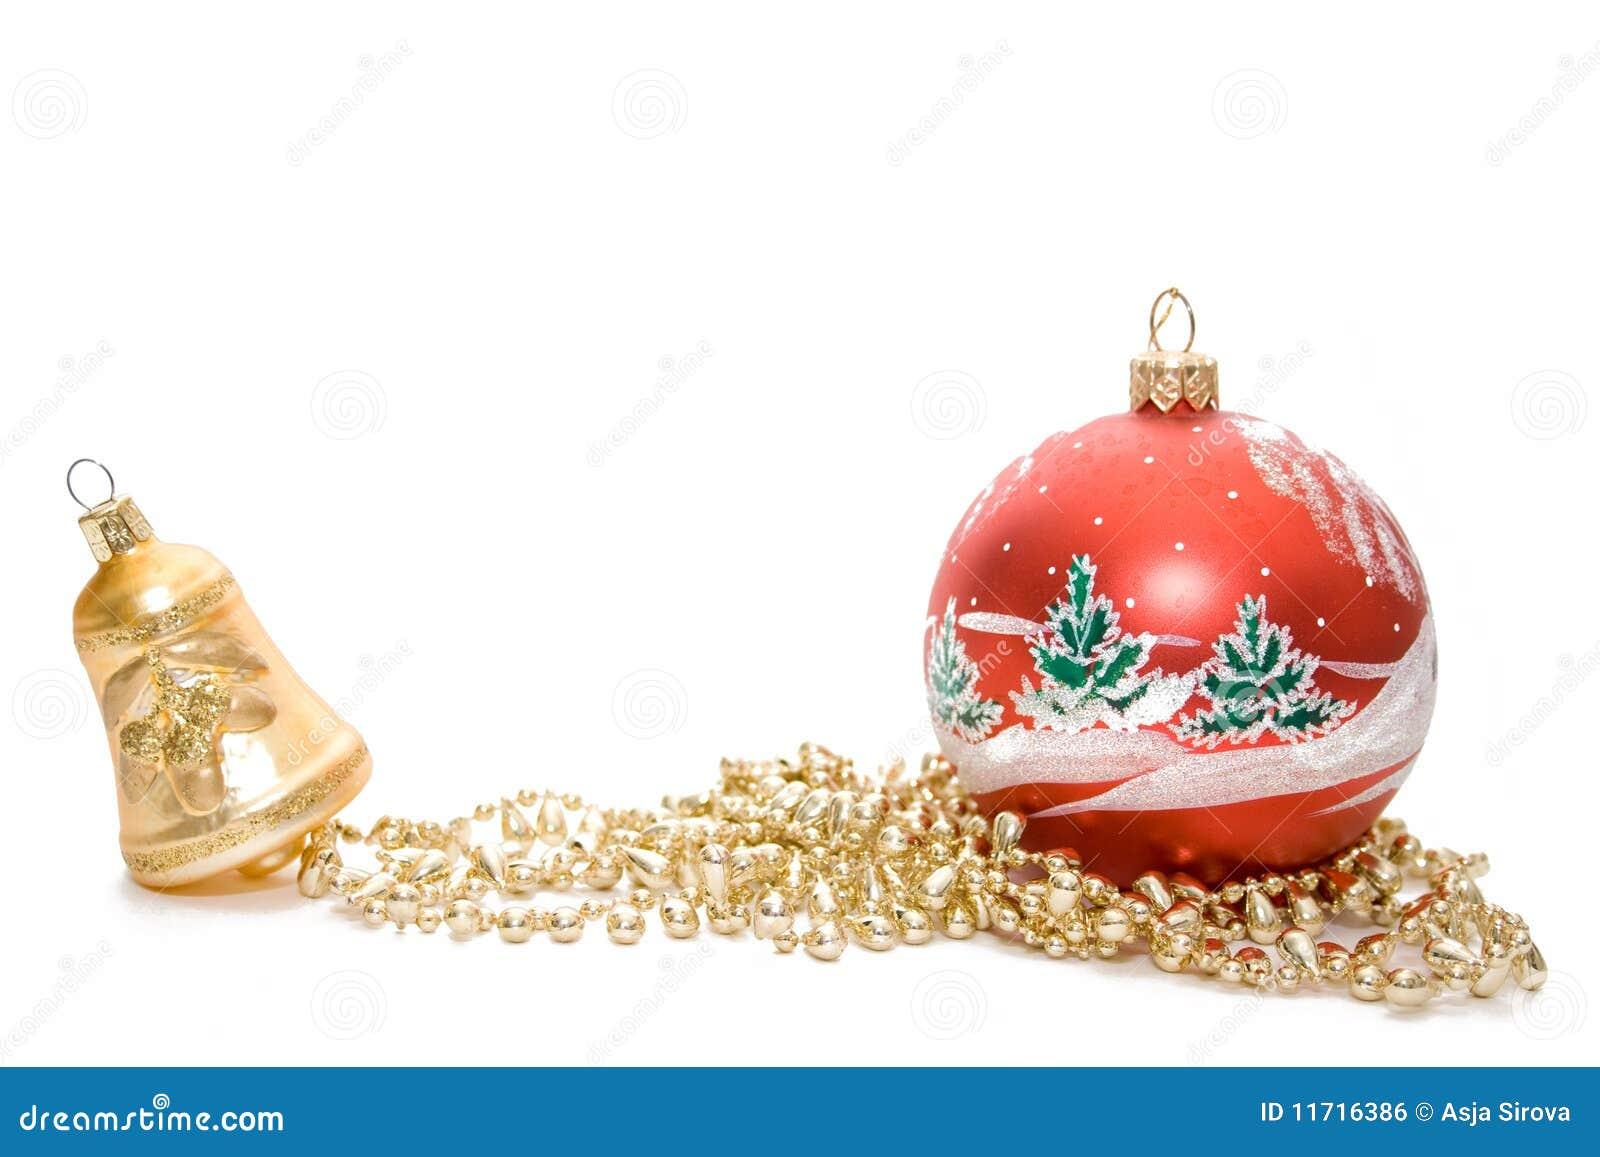 #8C2810 Christmas Decoration Royalty Free Stock Image Image  6361 décoration noel commerce 1300x957 px @ aertt.com